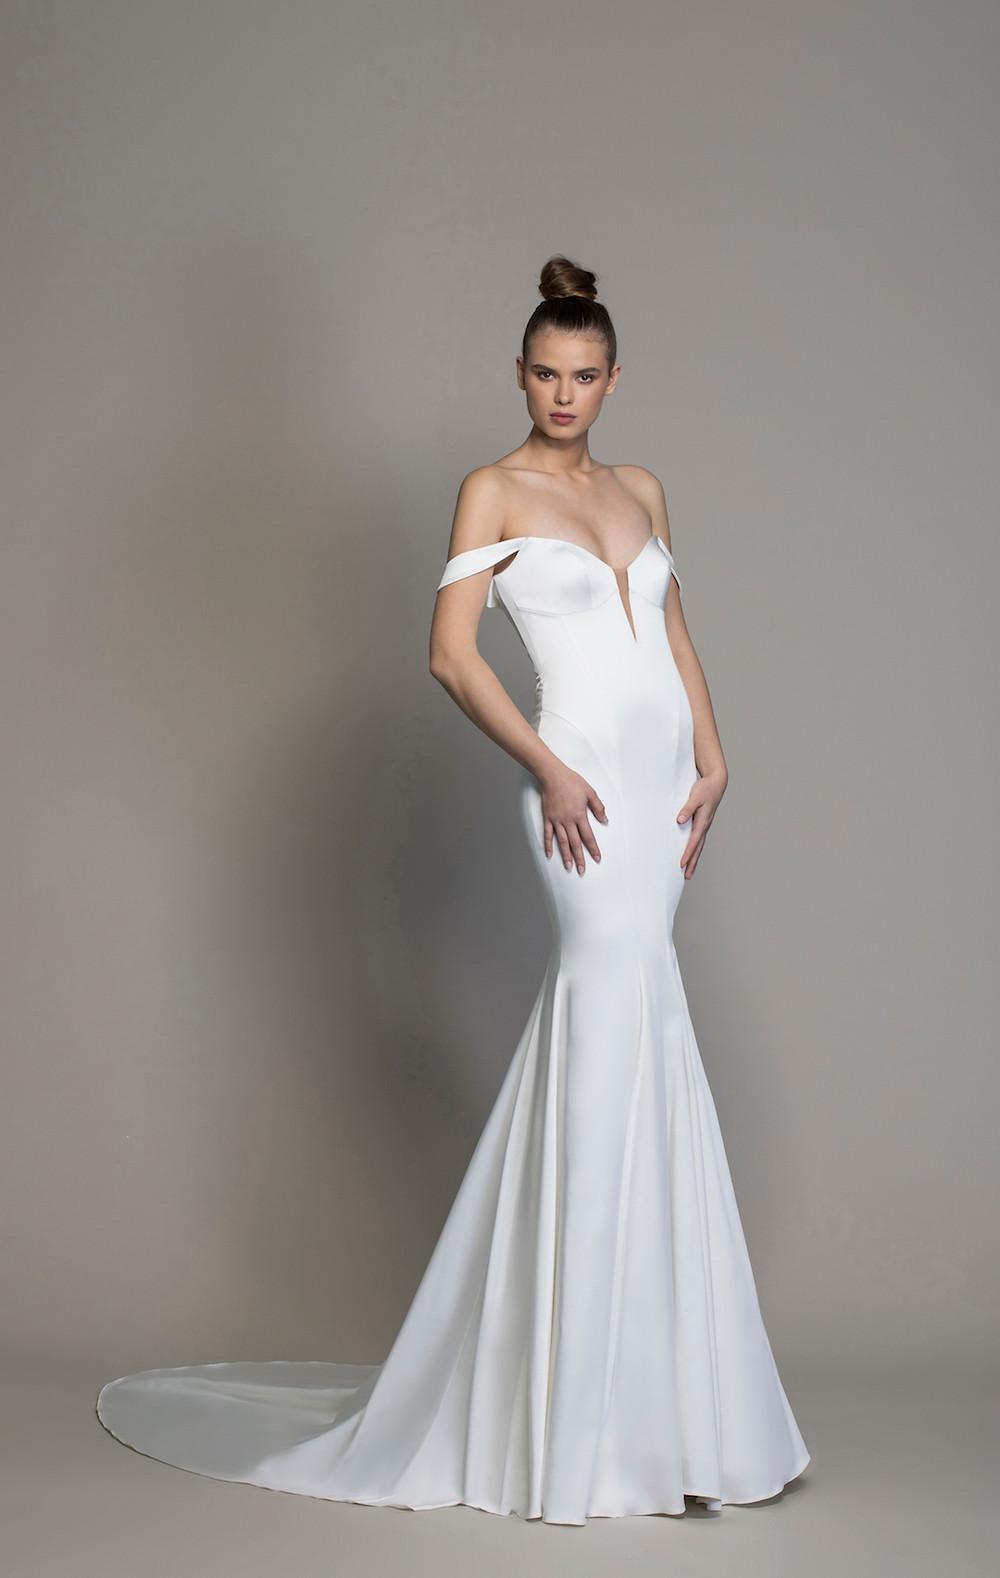 TOP 20 WEDDING DRESSES FOR SUMMER WEDDINGS